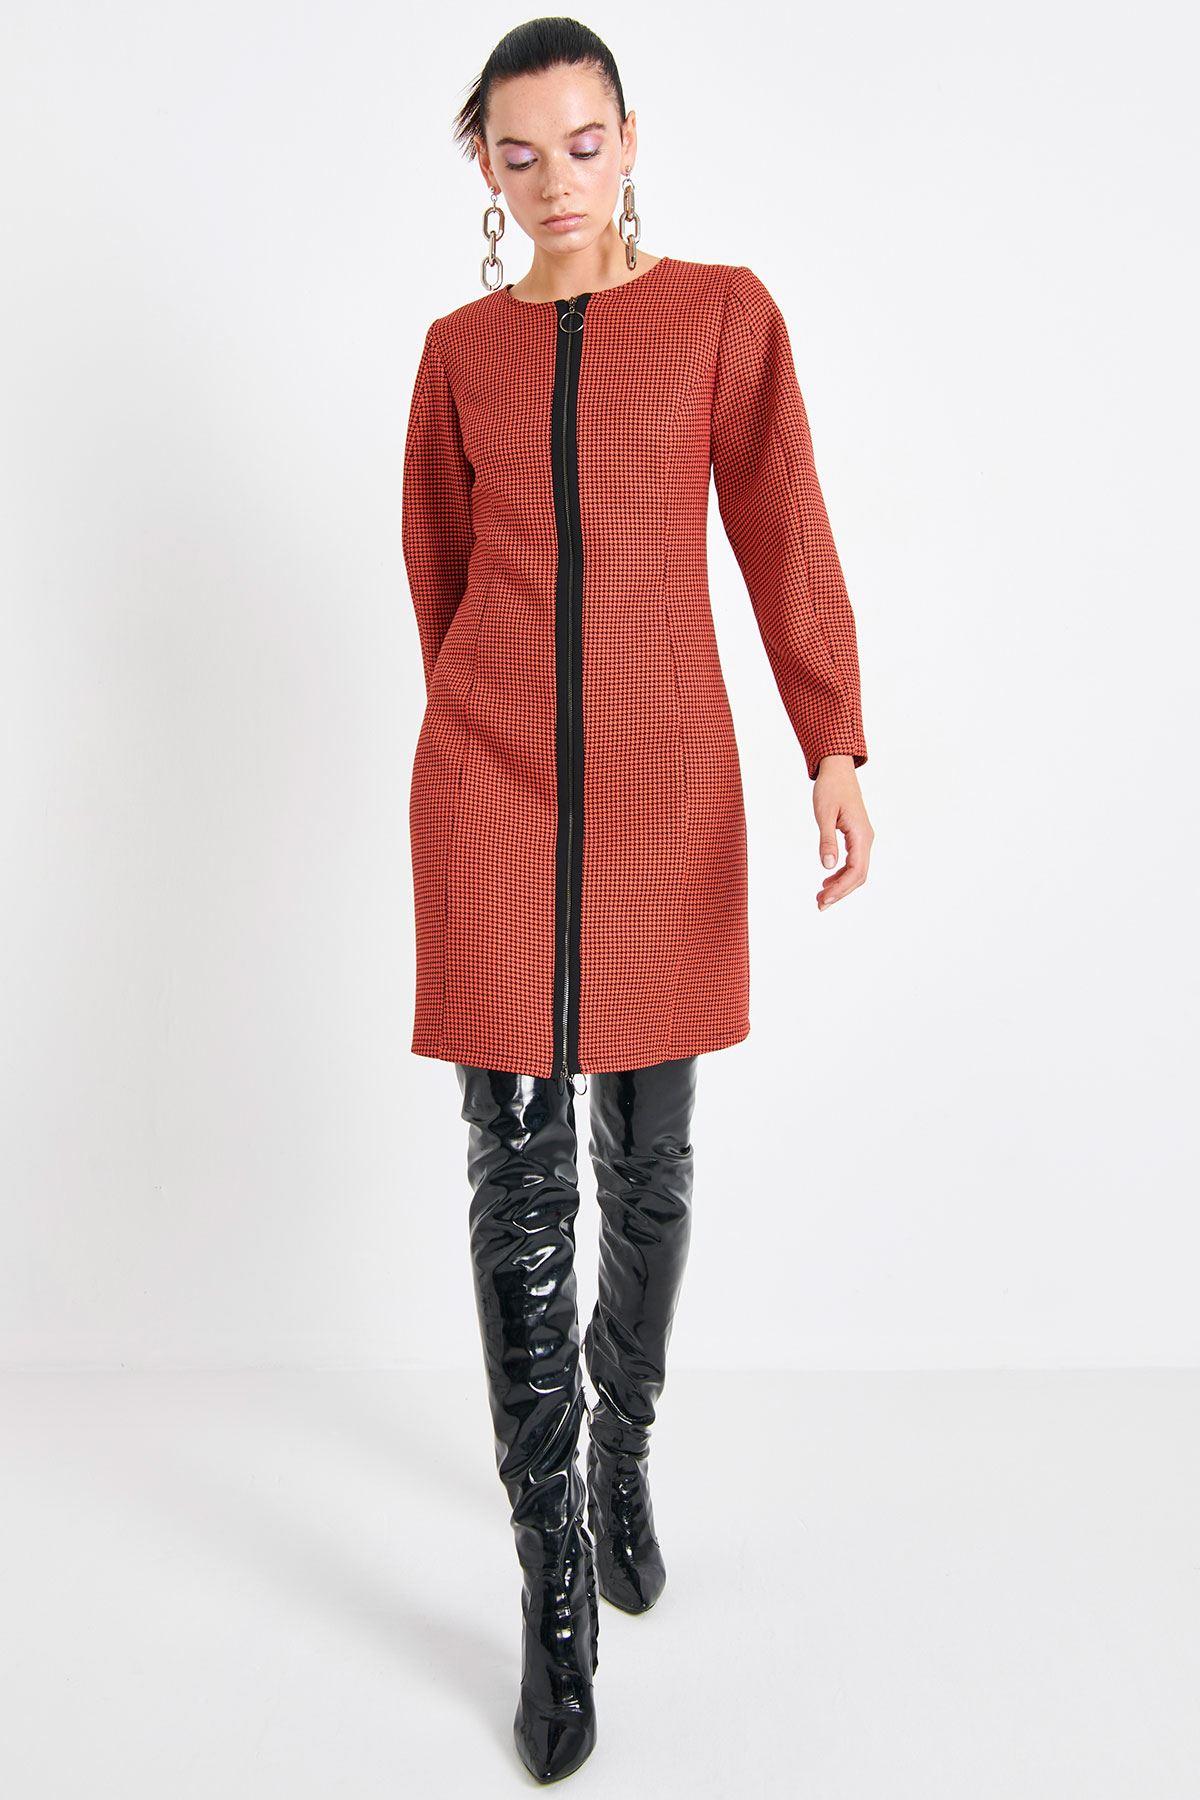 Pötikare Metal Fermuarlı Elbise Mercan